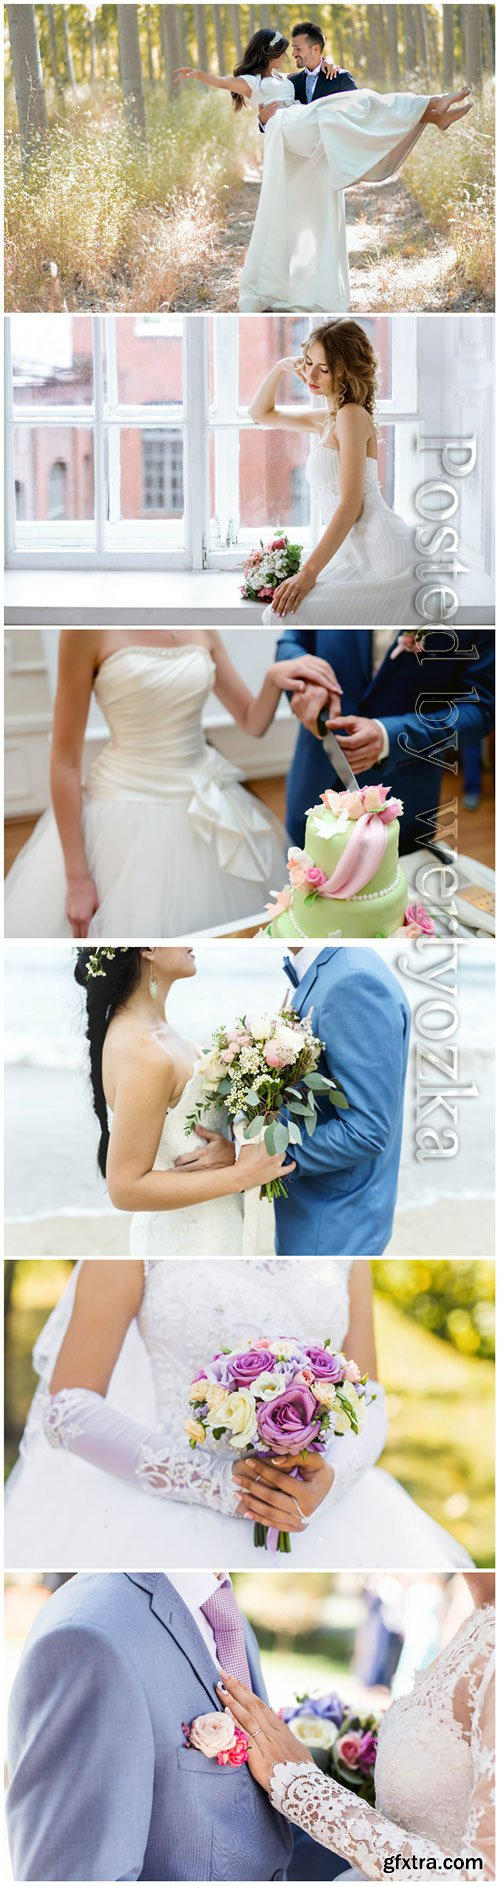 Wedding beautiful stock photo